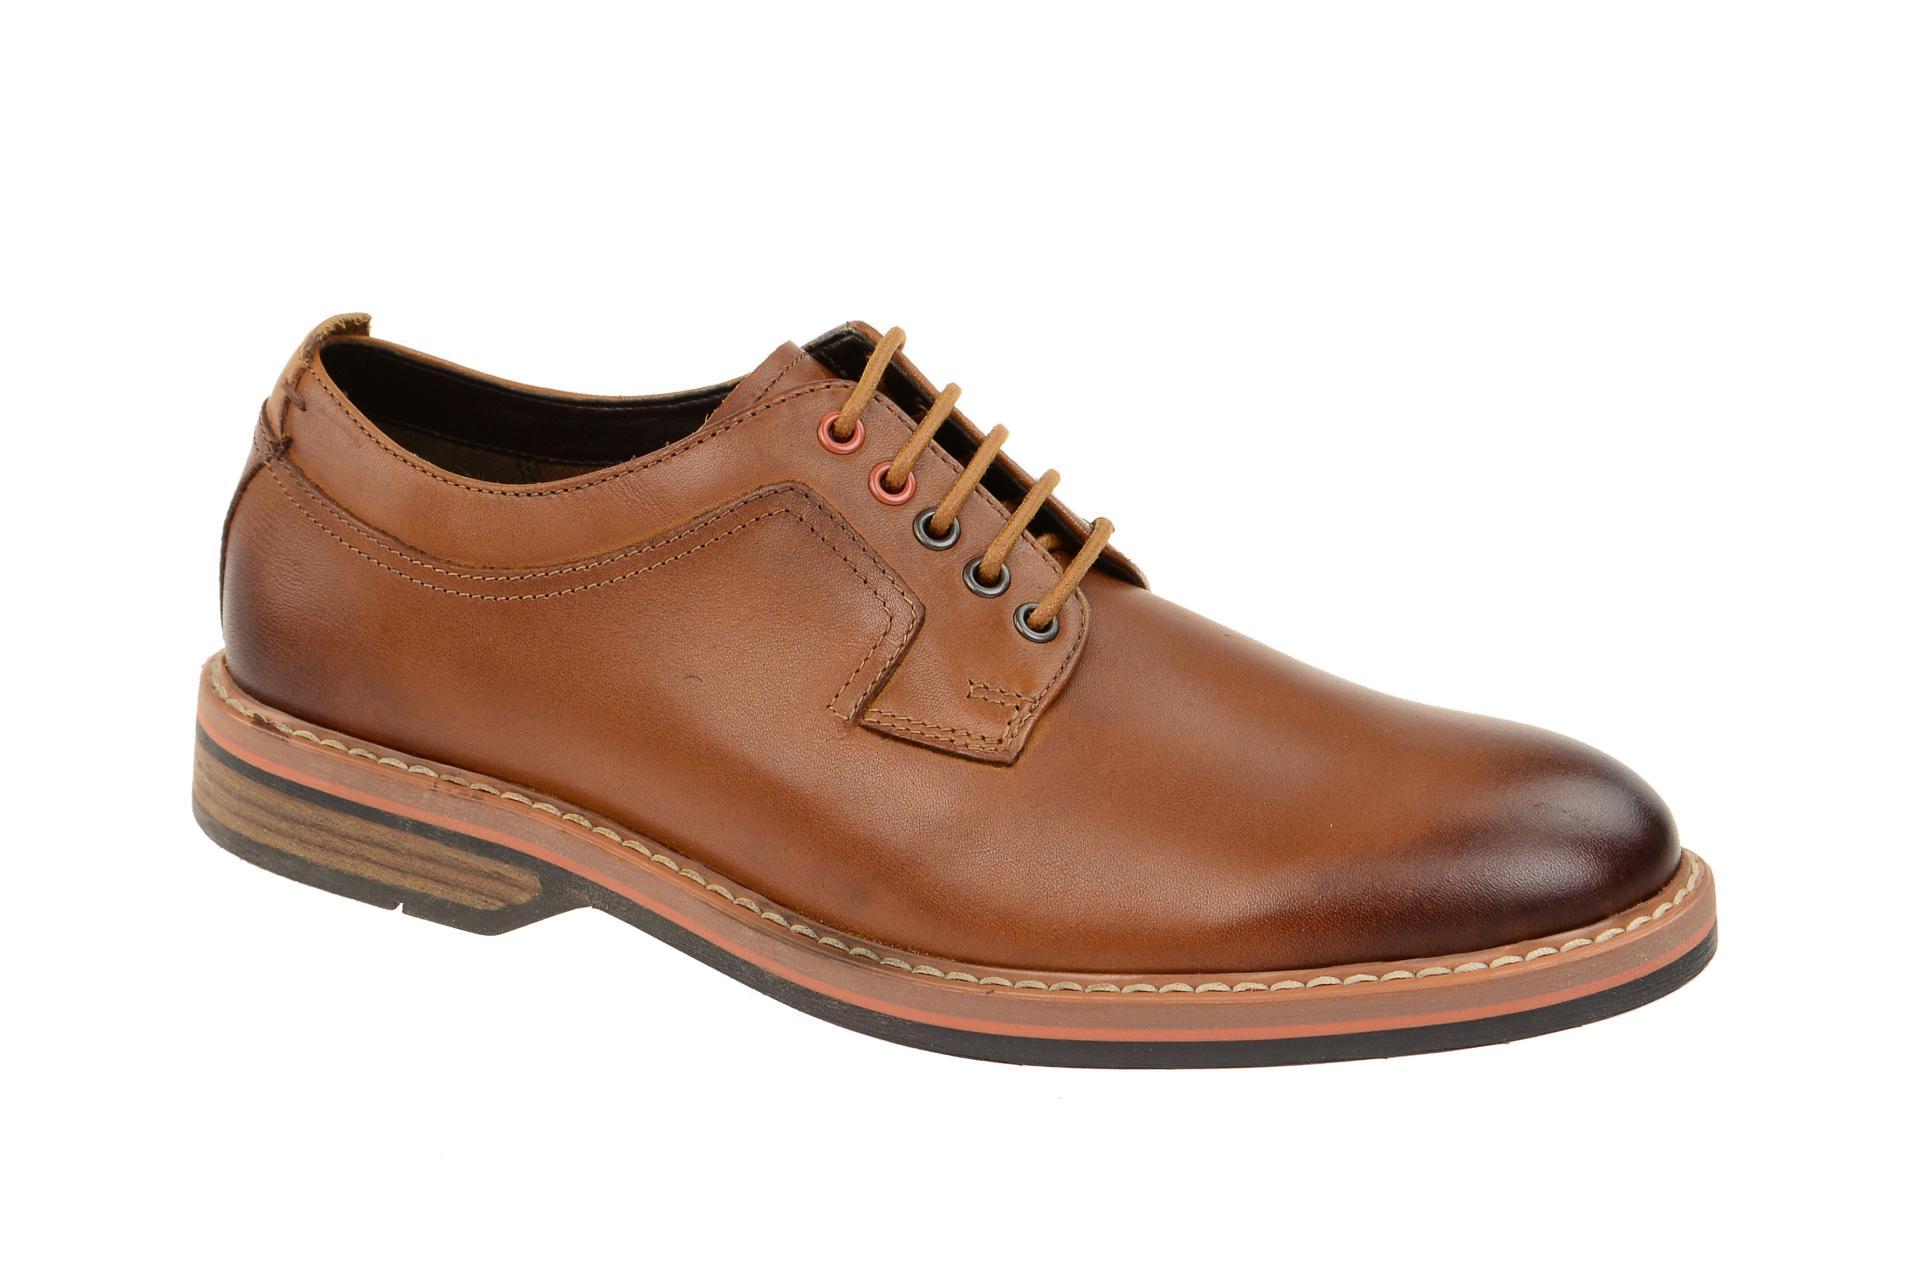 Clarks Pitney Walk Schuhe hell braun